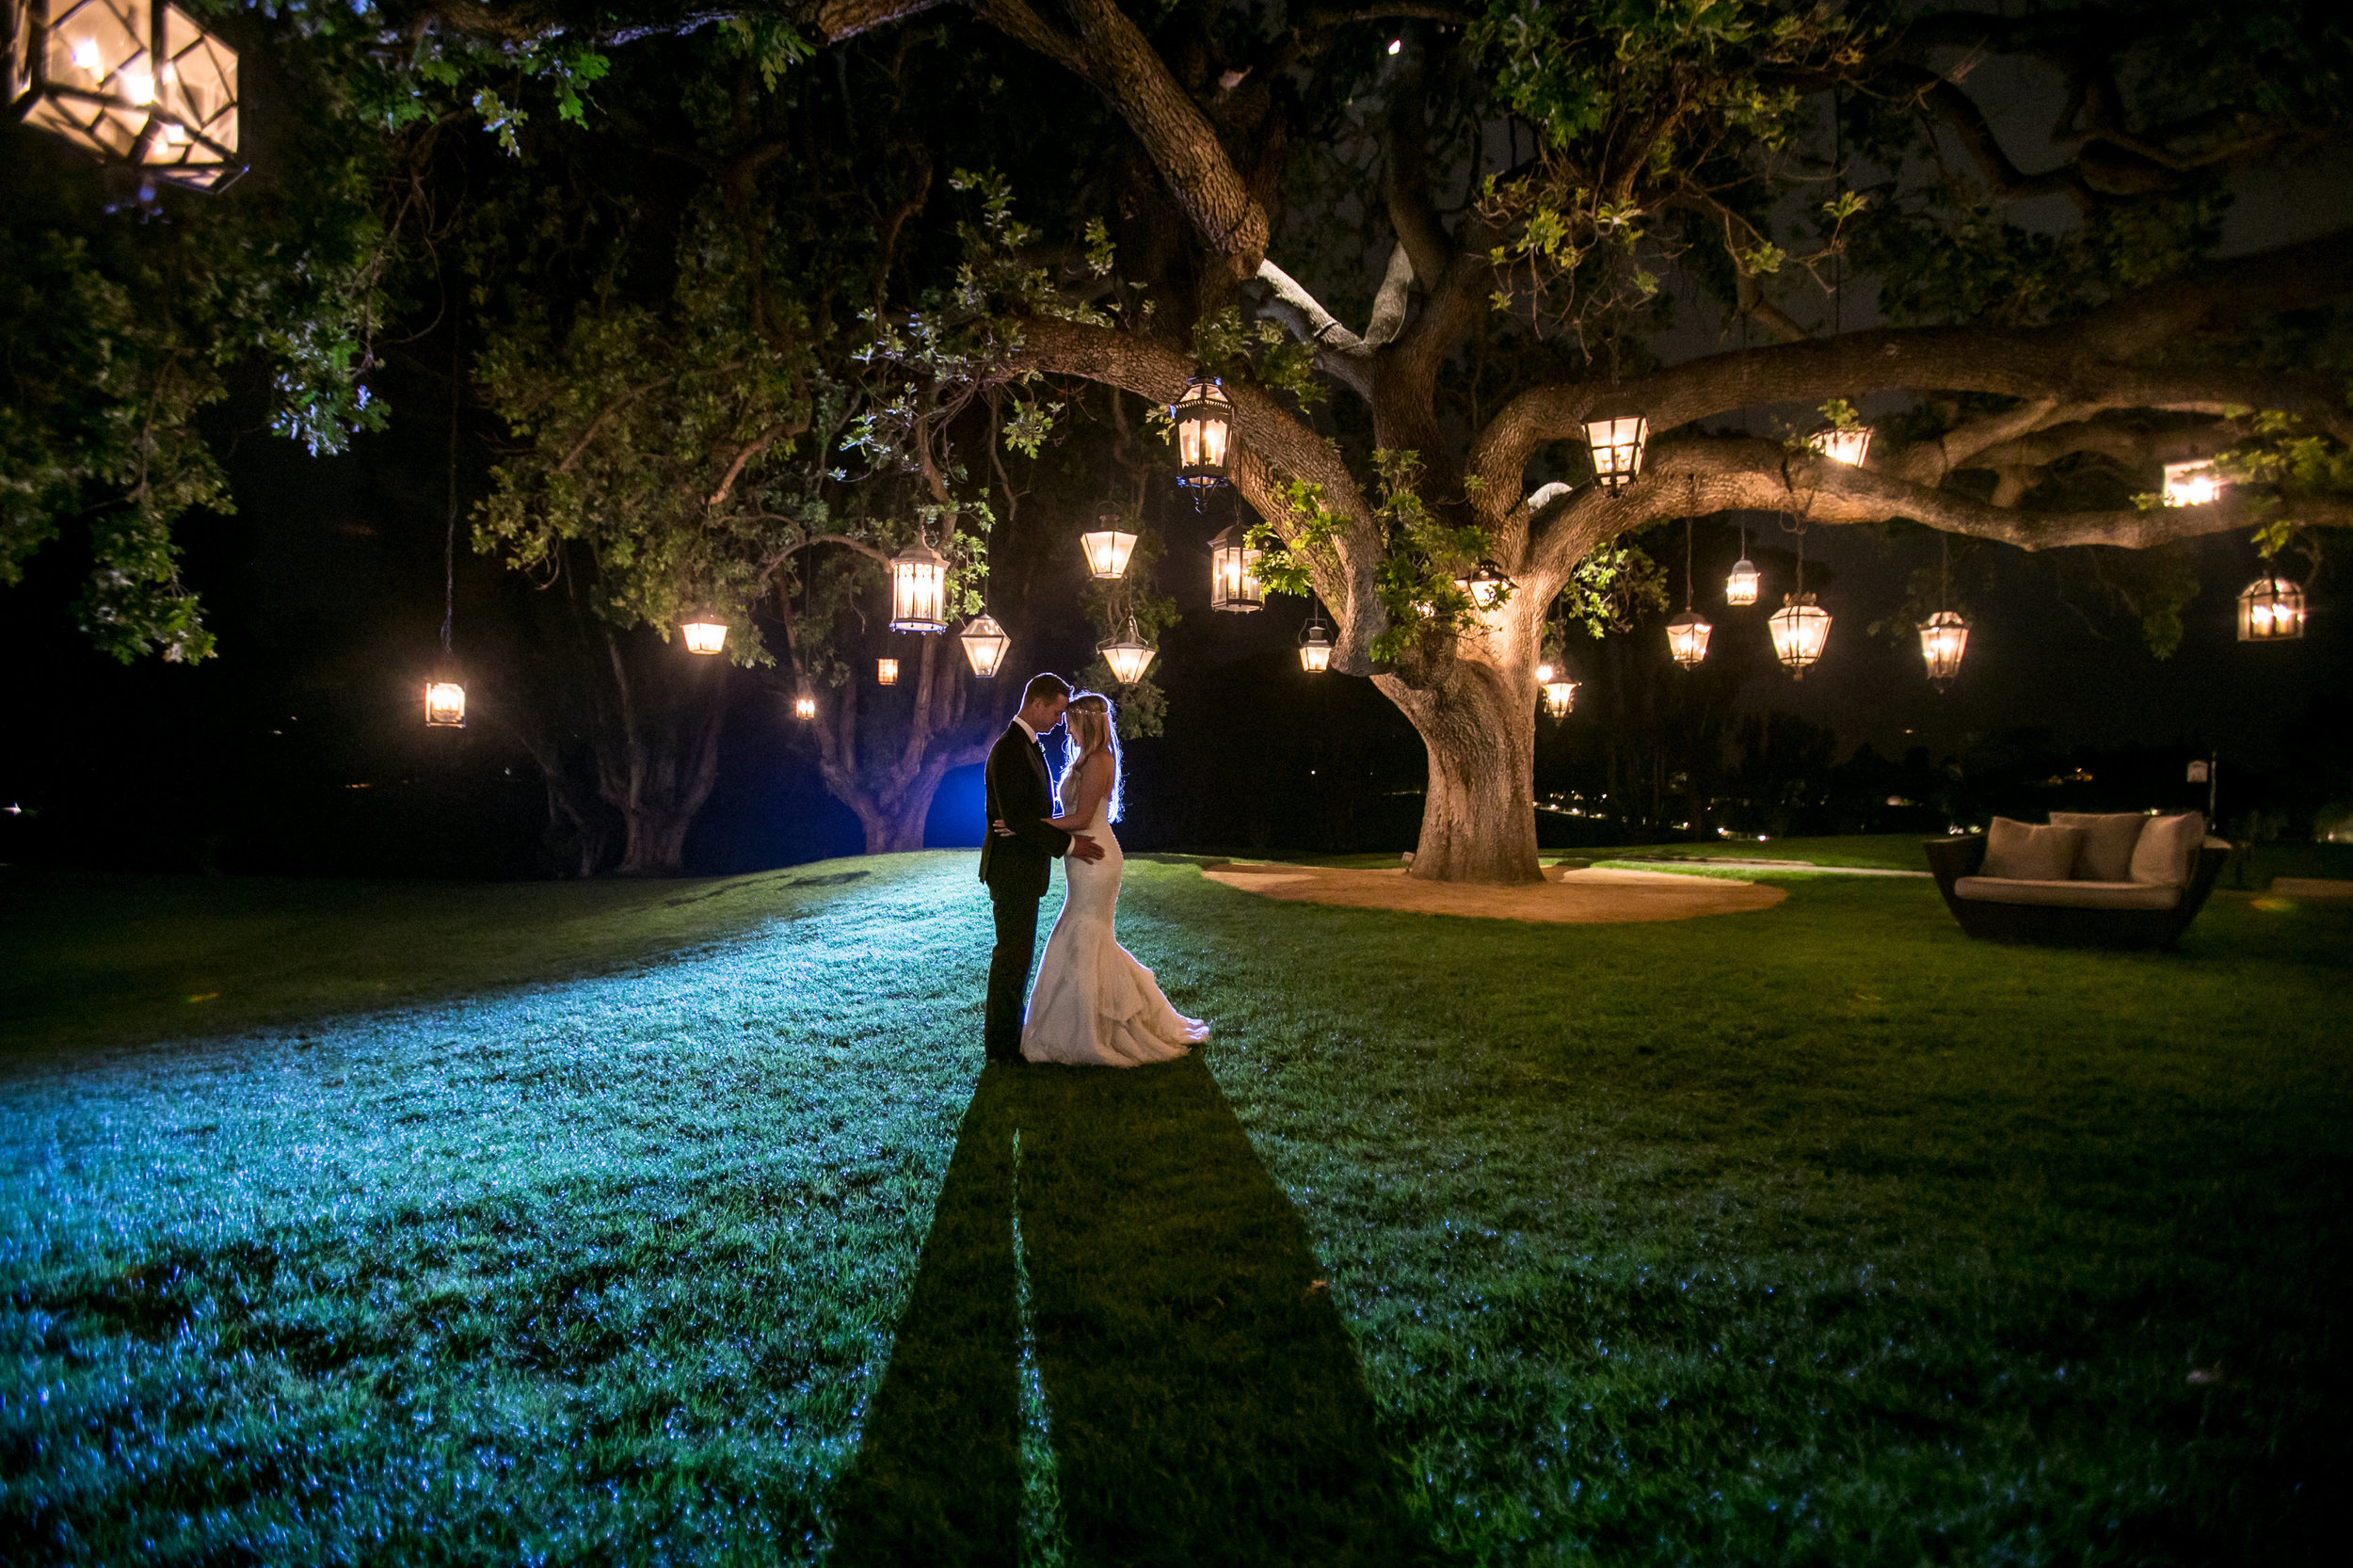 bride and groom nighttime photo